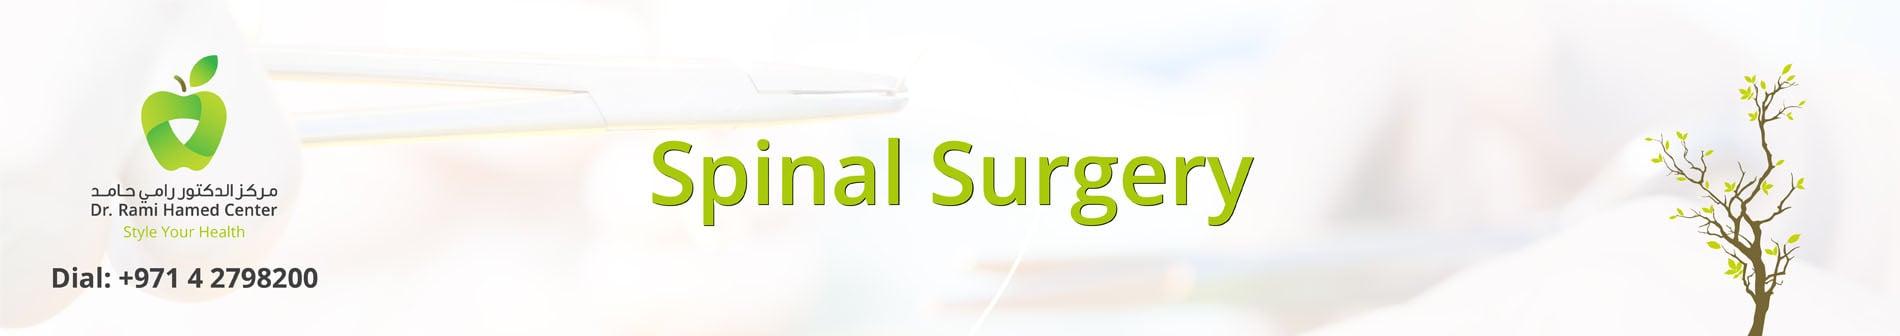 Percutaneous Lumbar Discectomy Nucleoplasty